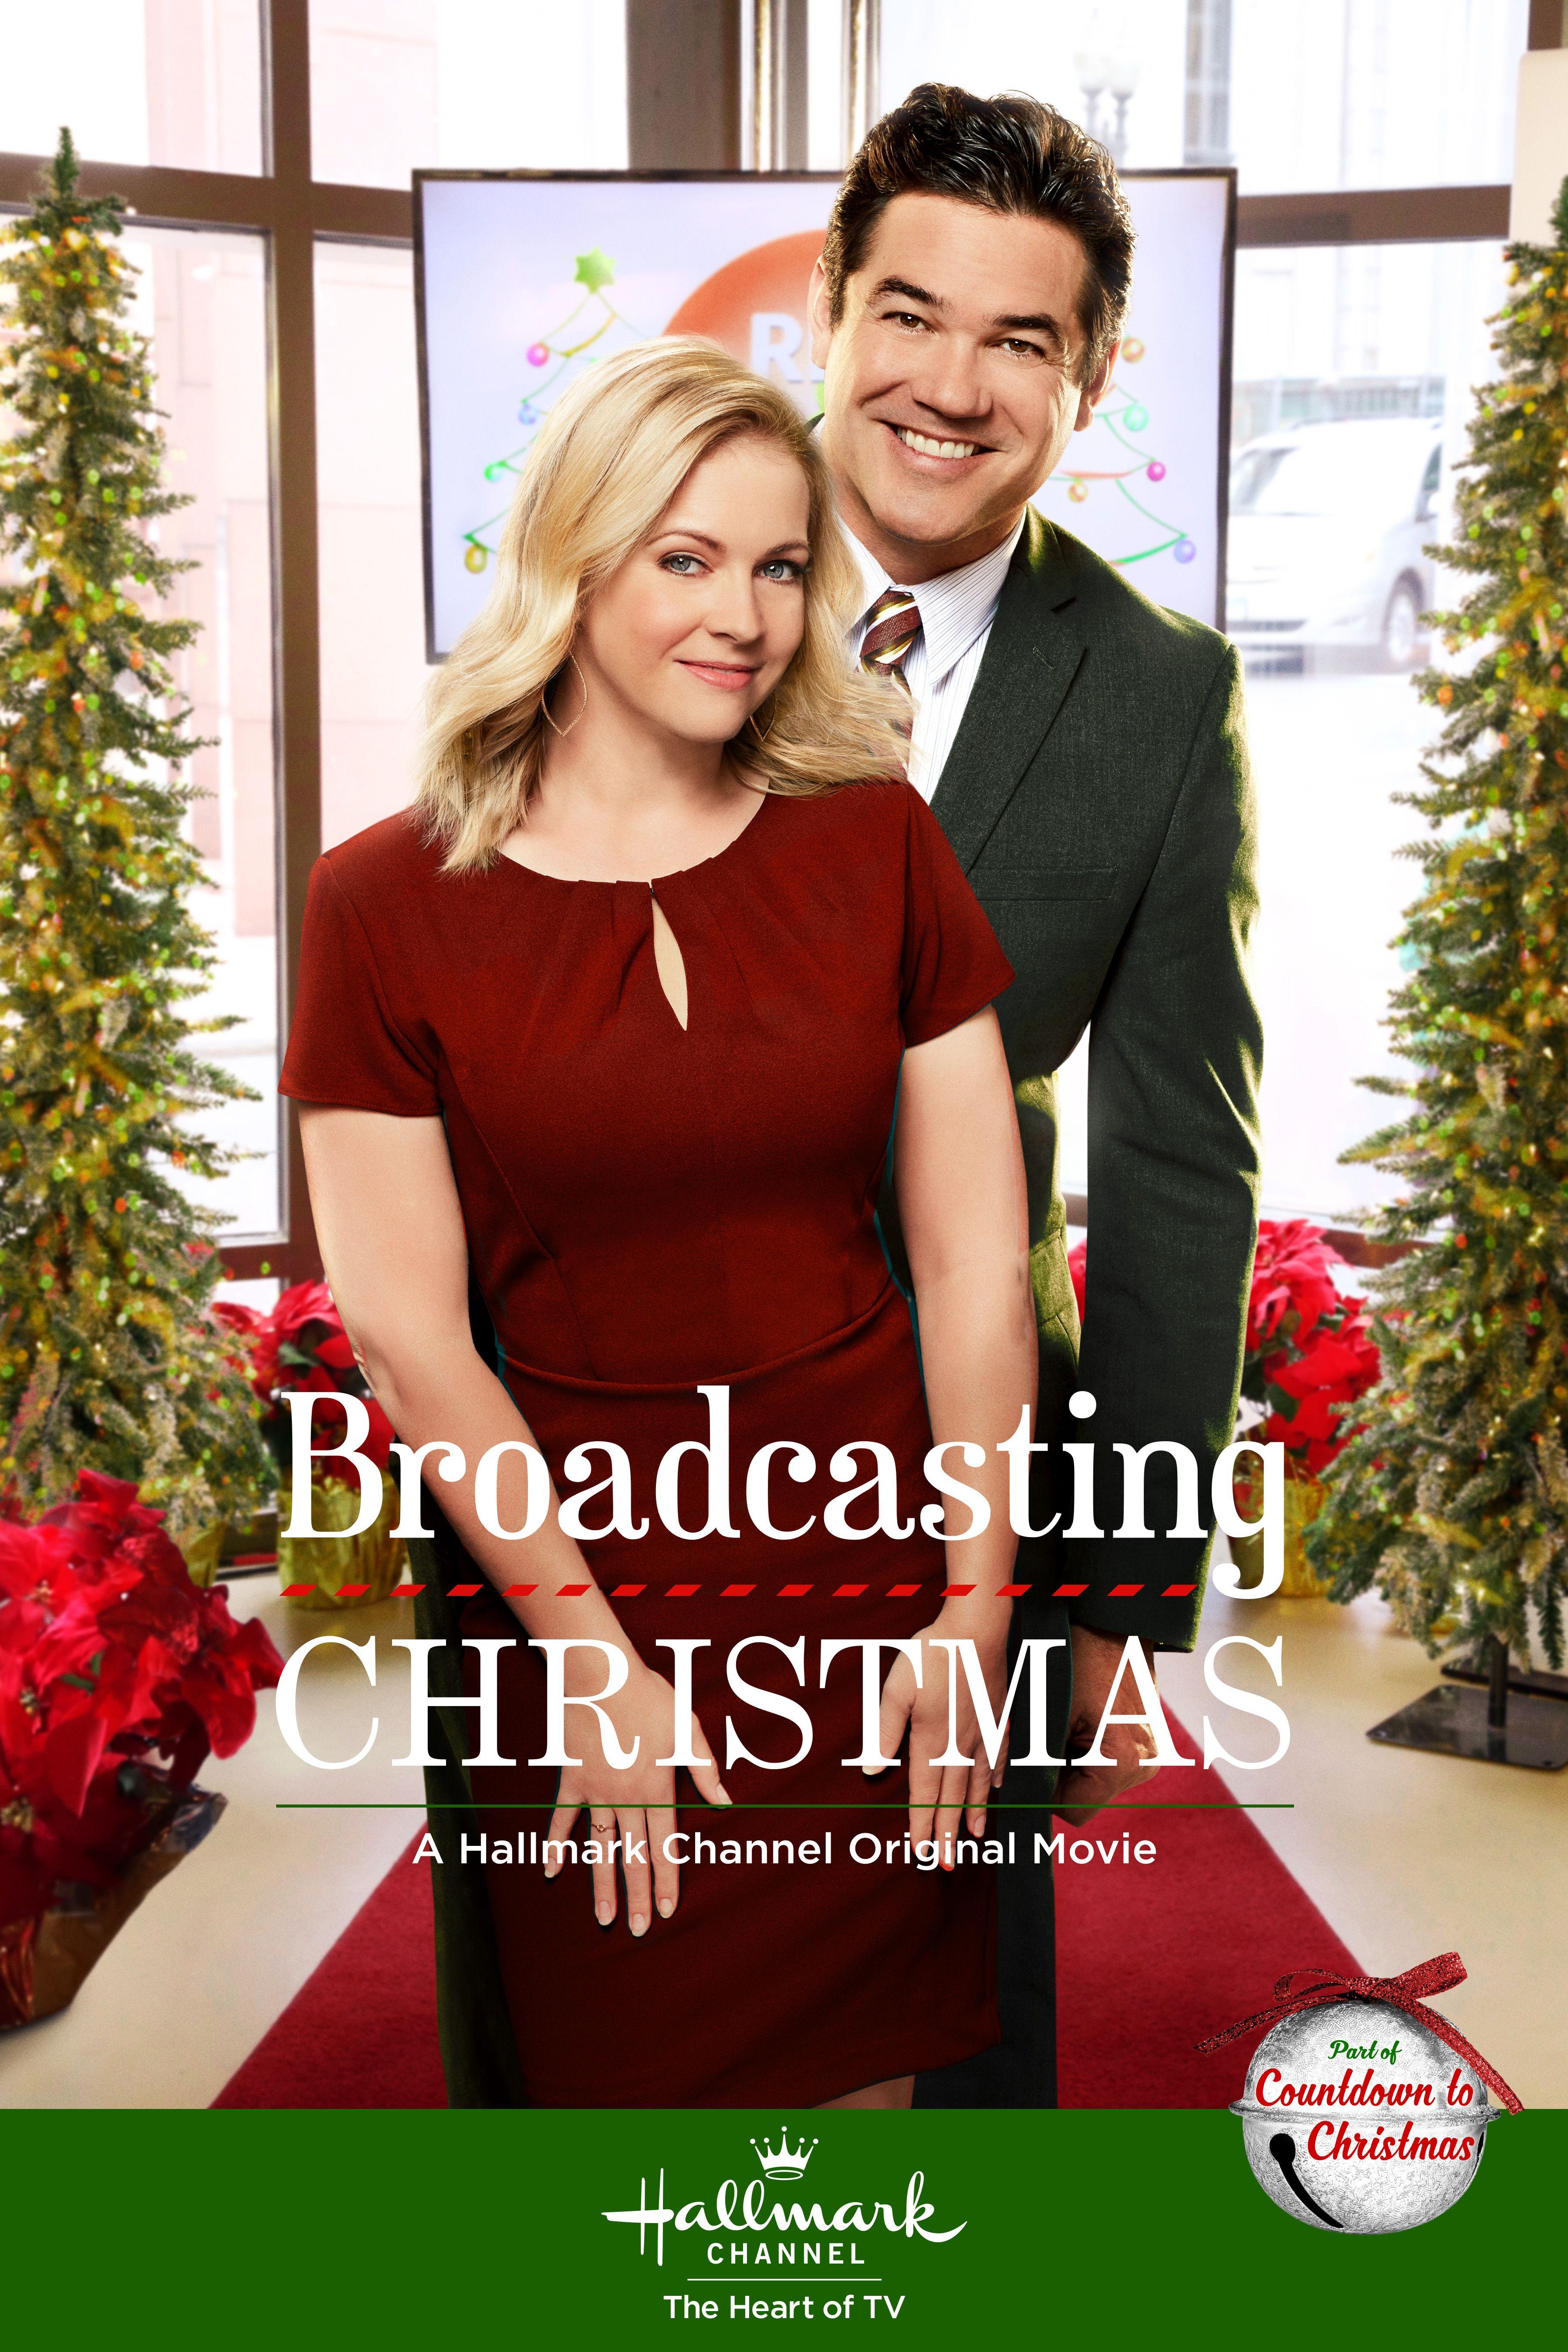 Hallmark S Broadcasting Christmas 2016 With Images Hallmark